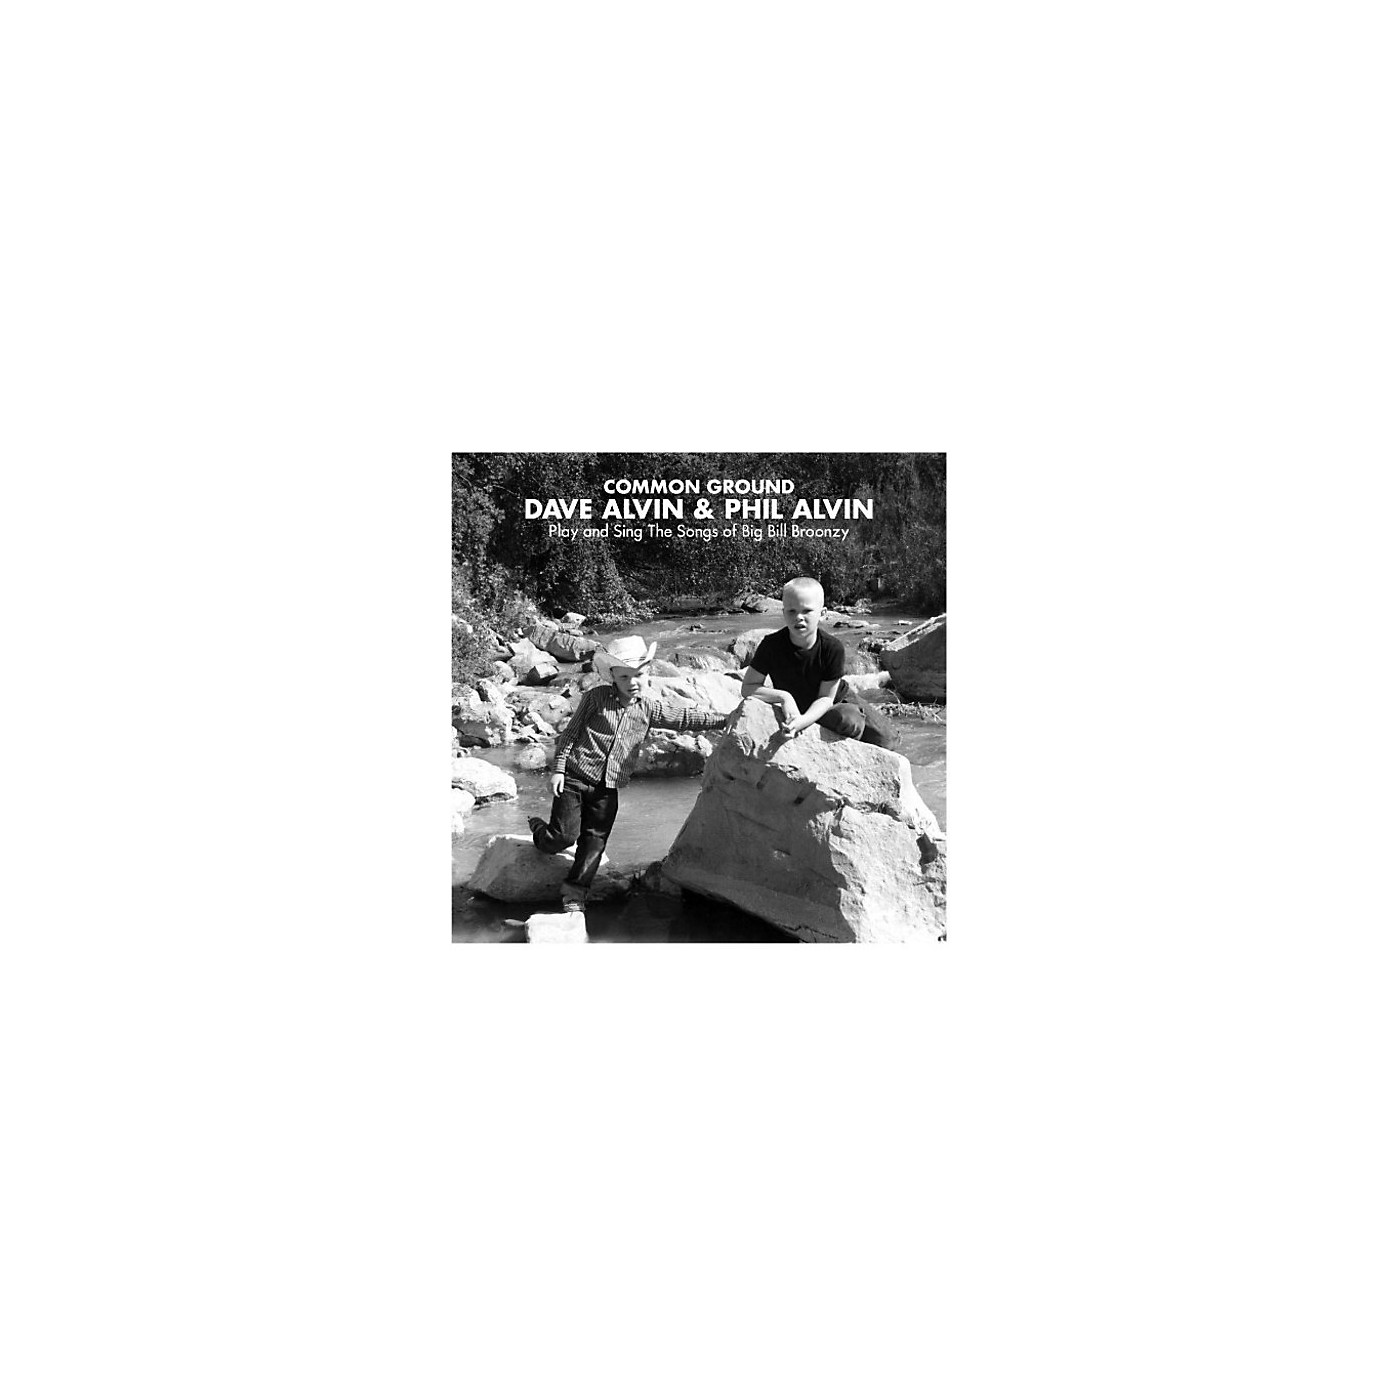 Alliance Phil Alvin - Common Ground: Dave Alvin & Phil Alvin Play & Sing thumbnail